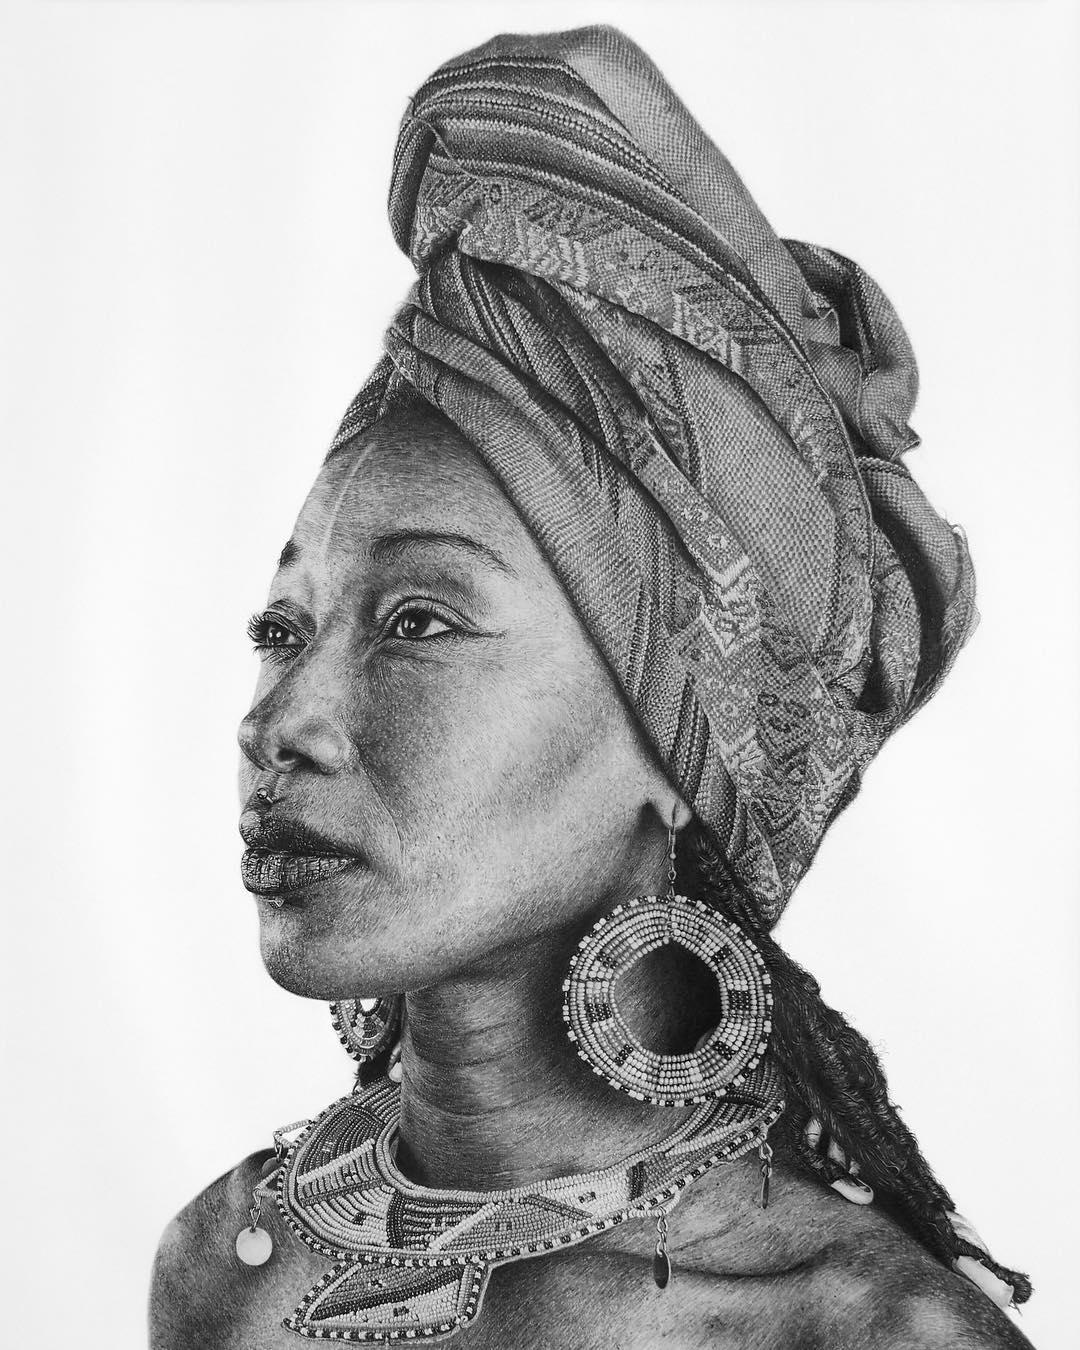 01-Fatoumata-Diawara-Monica-Lee-zephyrxavier-Eclectic-Mixture-of-Pencil-Wild-Life-and-Portrait-Drawings-www-designstack-co